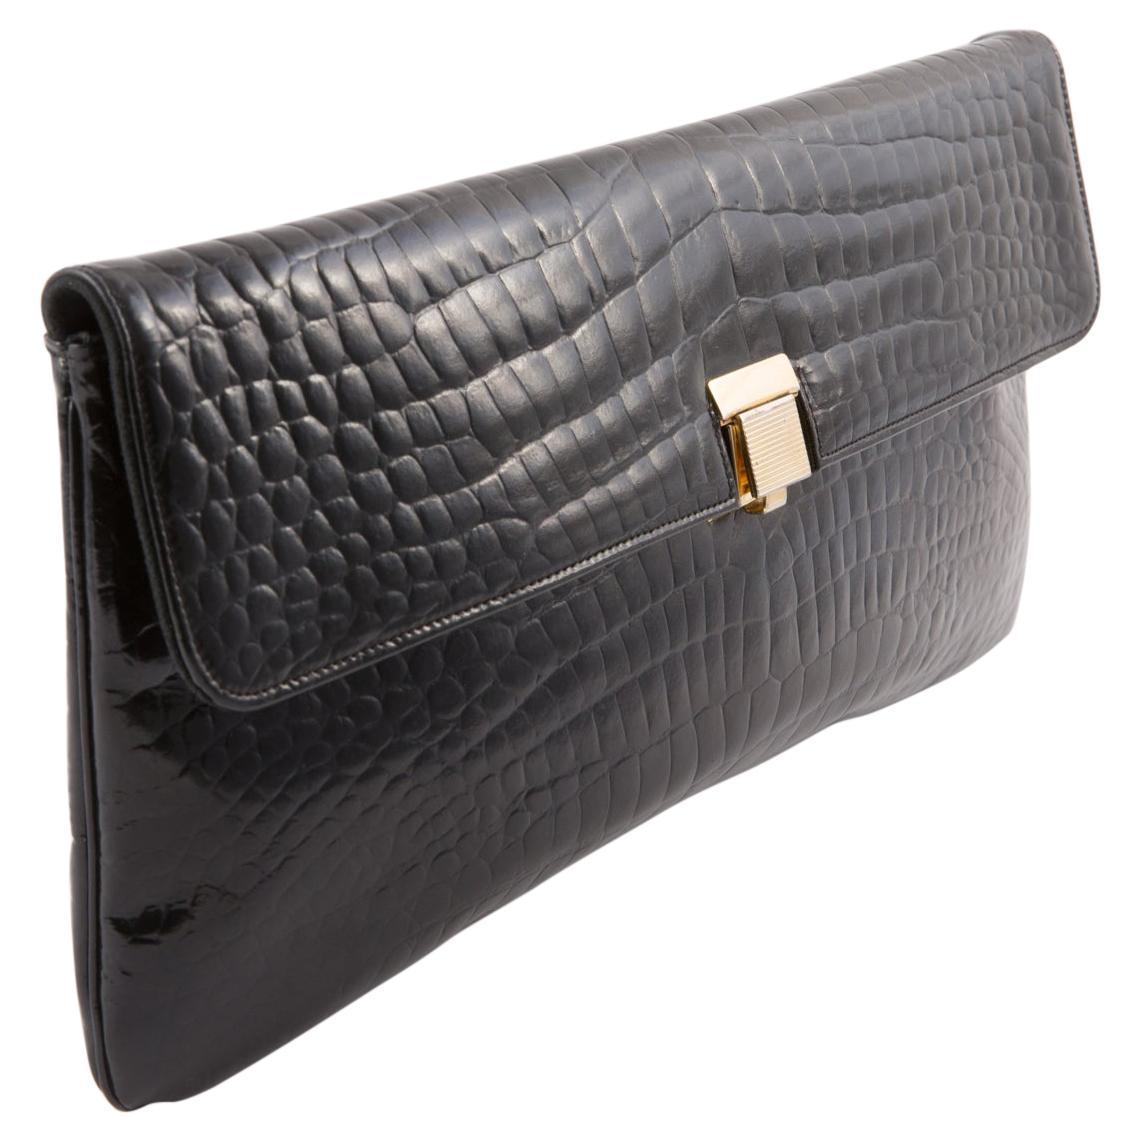 1970s Black Leather Long Evening Clutch Bag